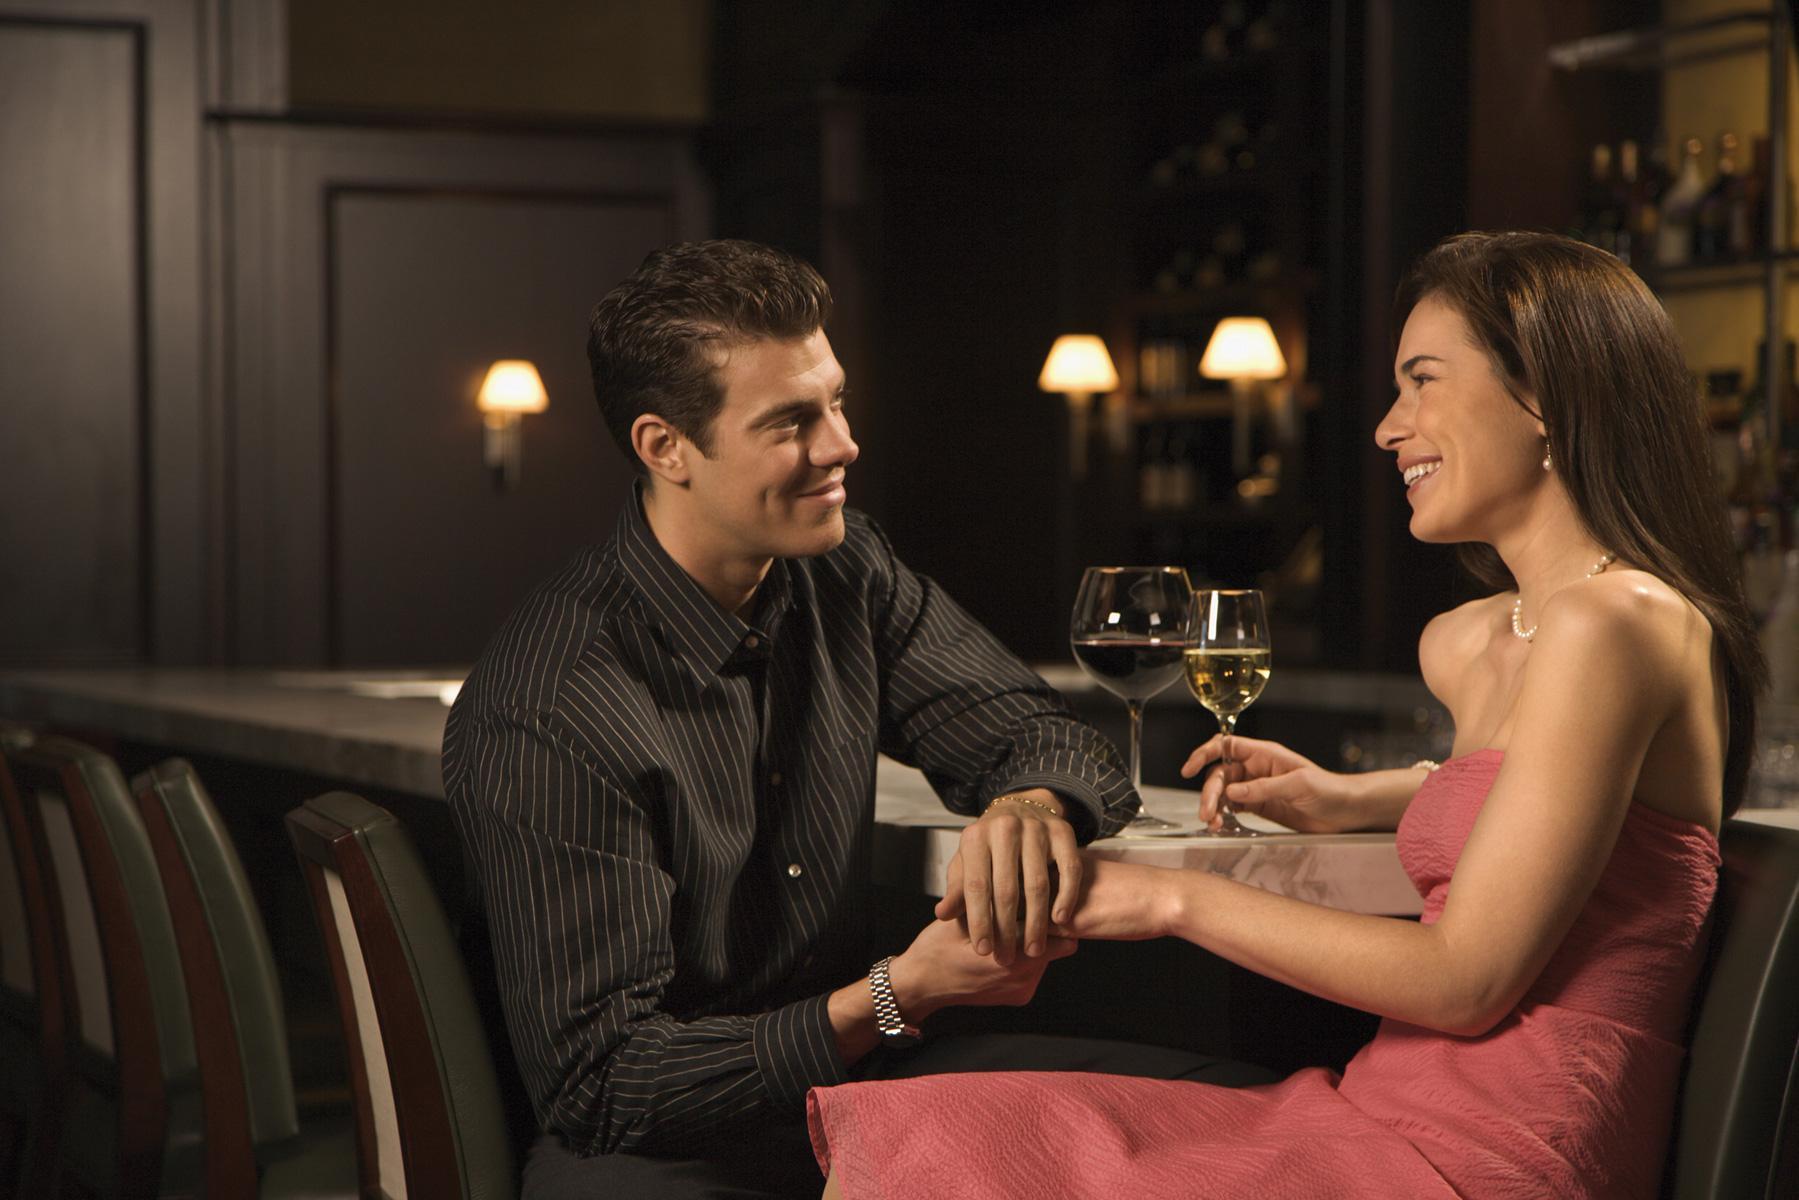 Adult bar couple